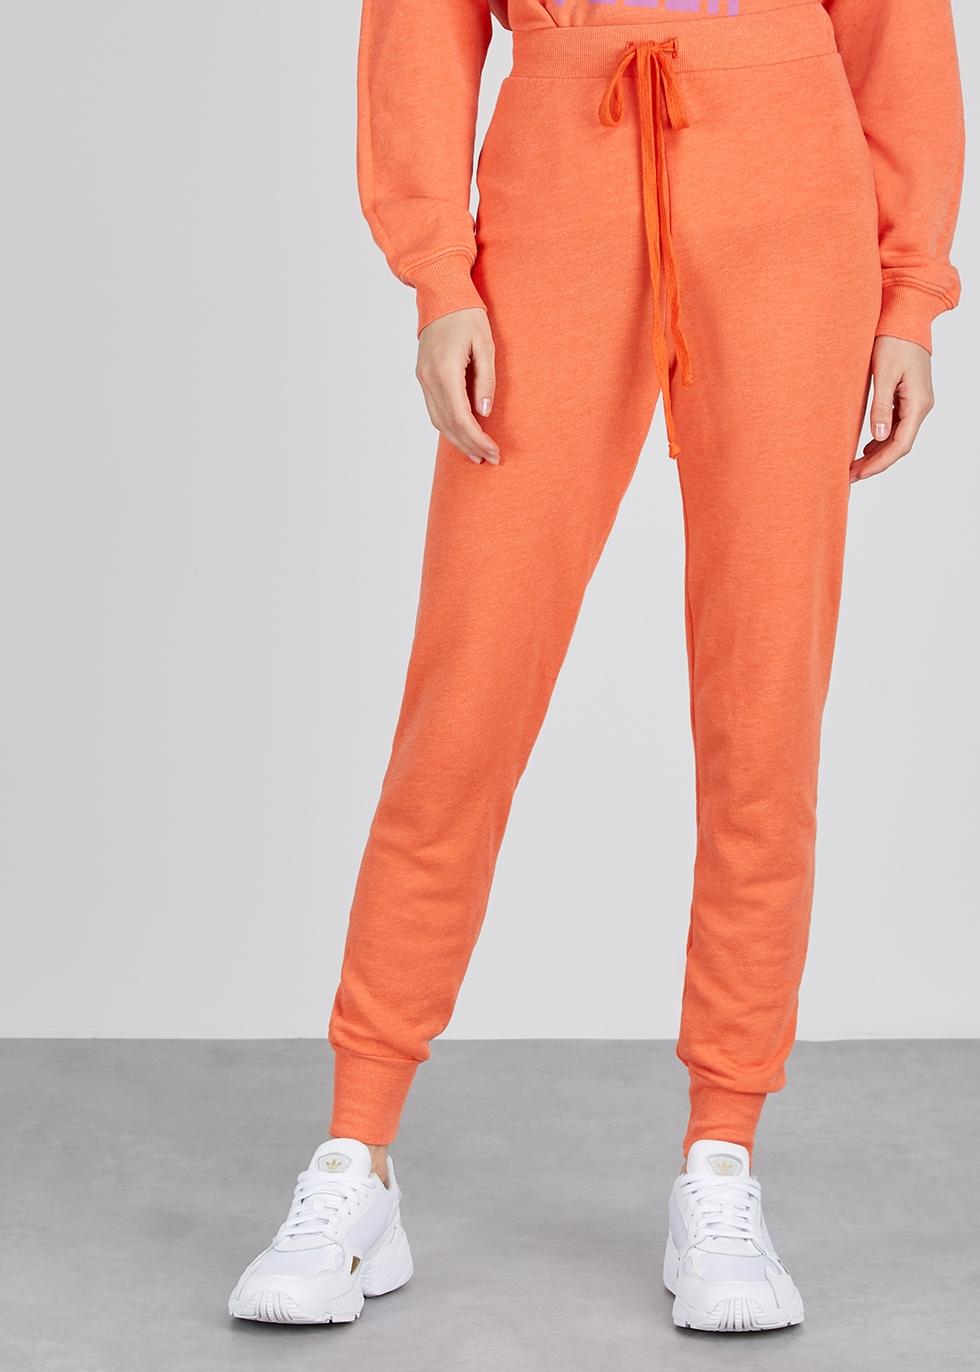 Jack orange jersey sweatpants - Wildfox